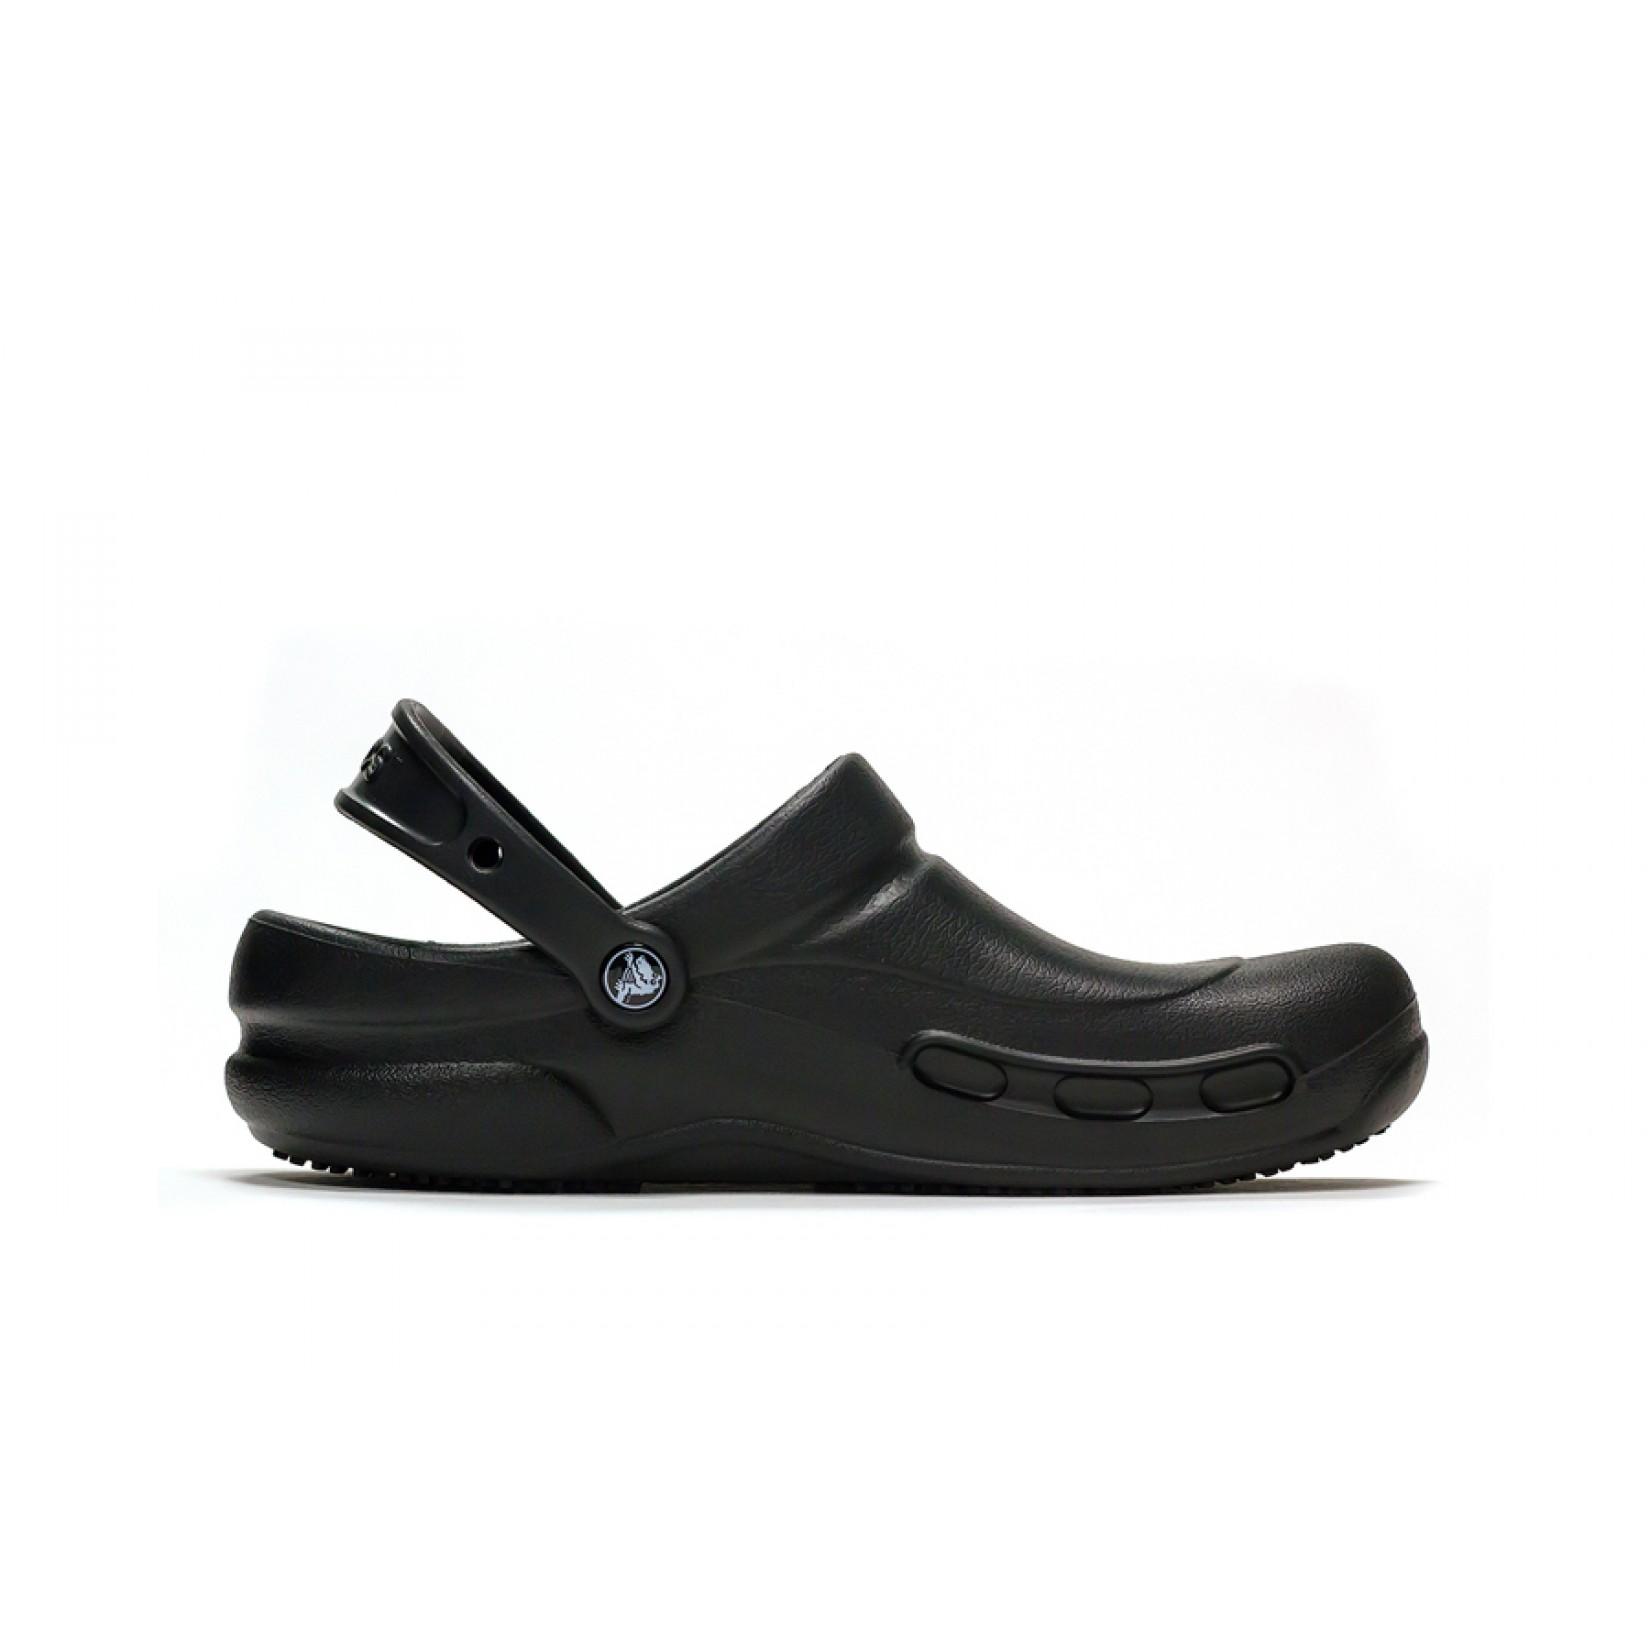 Crocs Bistro Black